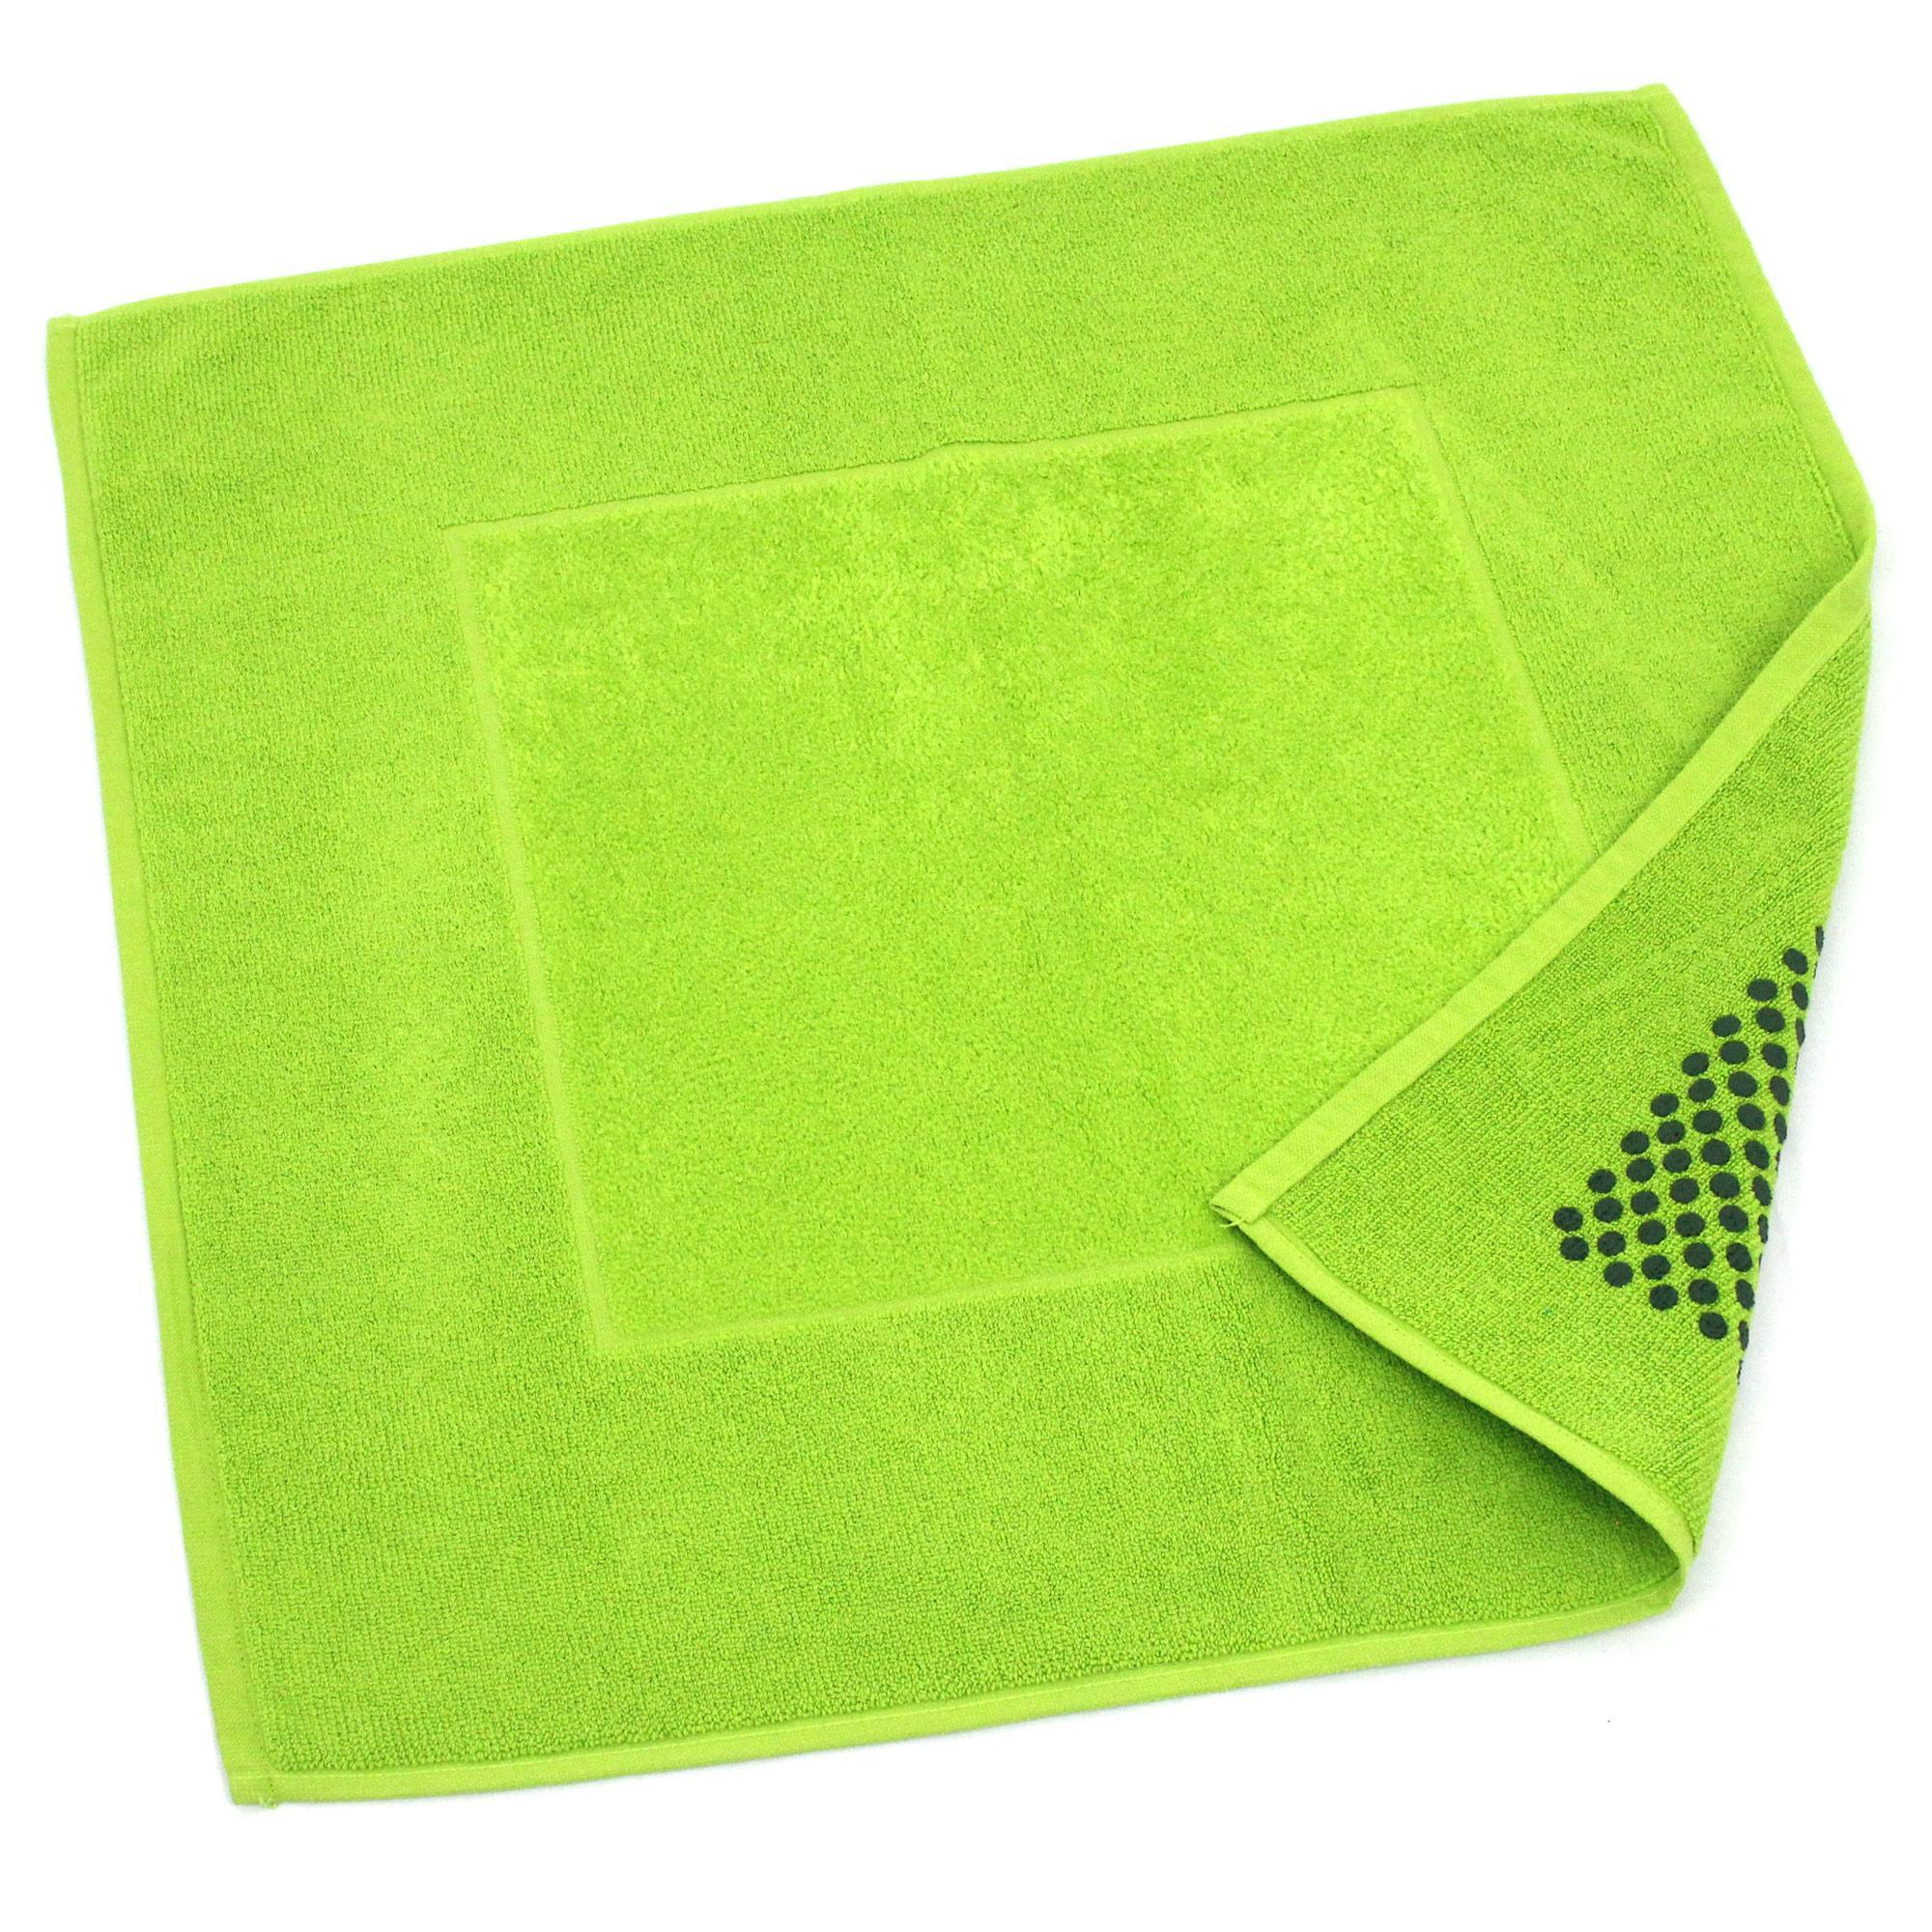 Linnea Tapis de bain antidérapant 60x60 cm velours PRESTIGE vert Pistache